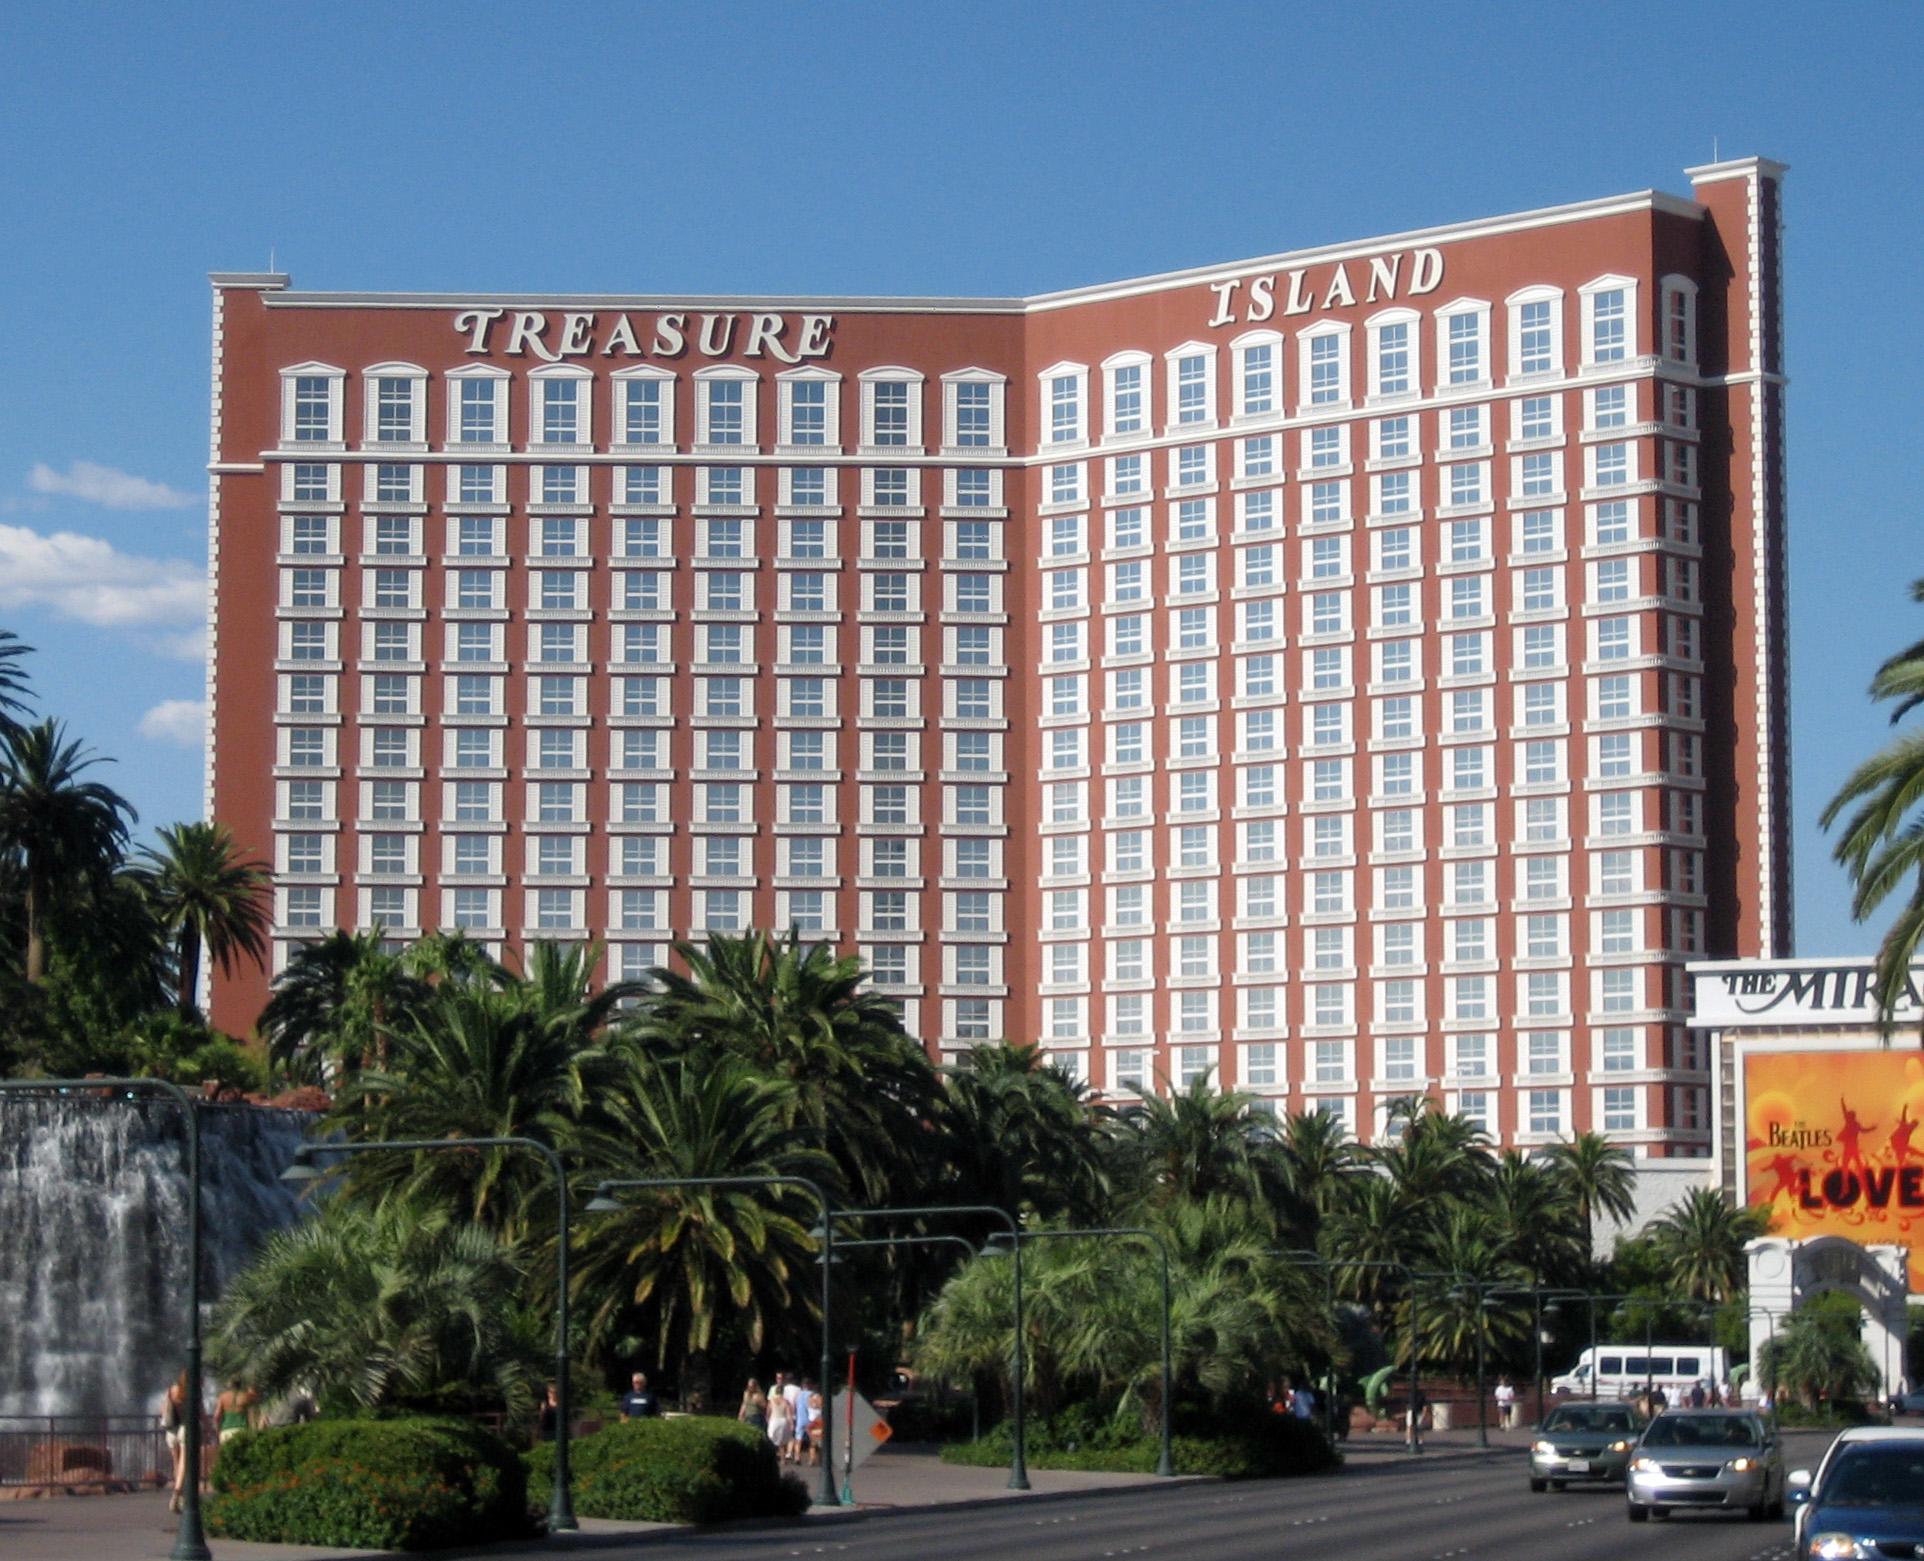 Aladdin Las Vegas Rooms